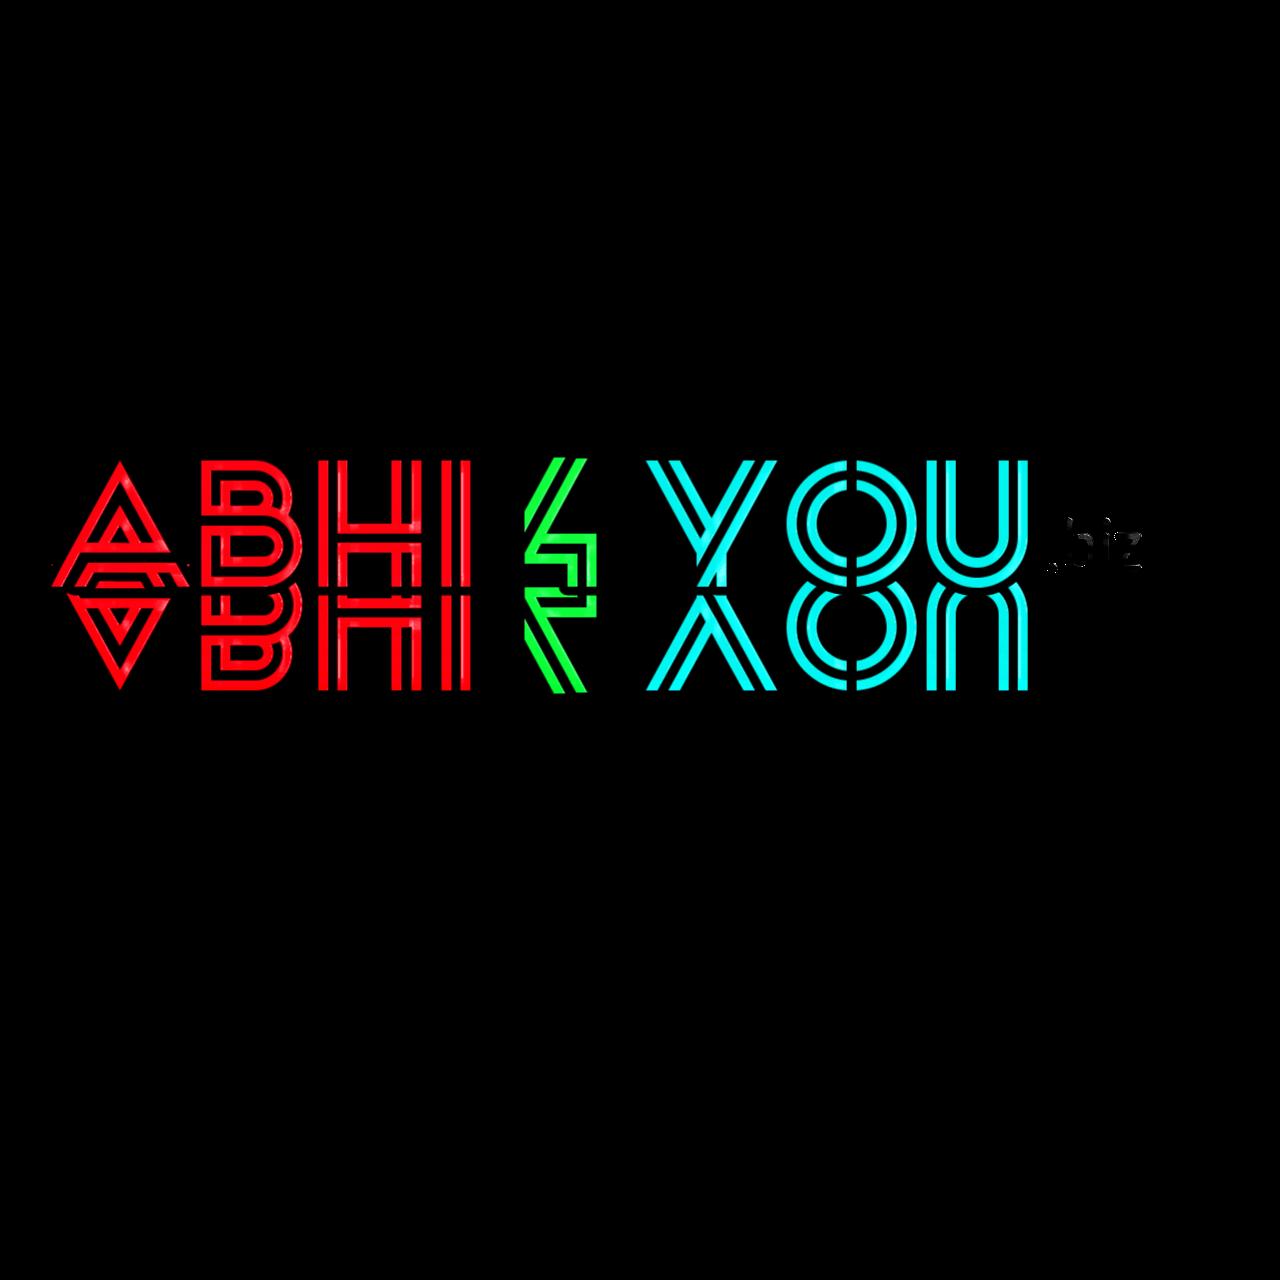 Abhi4you